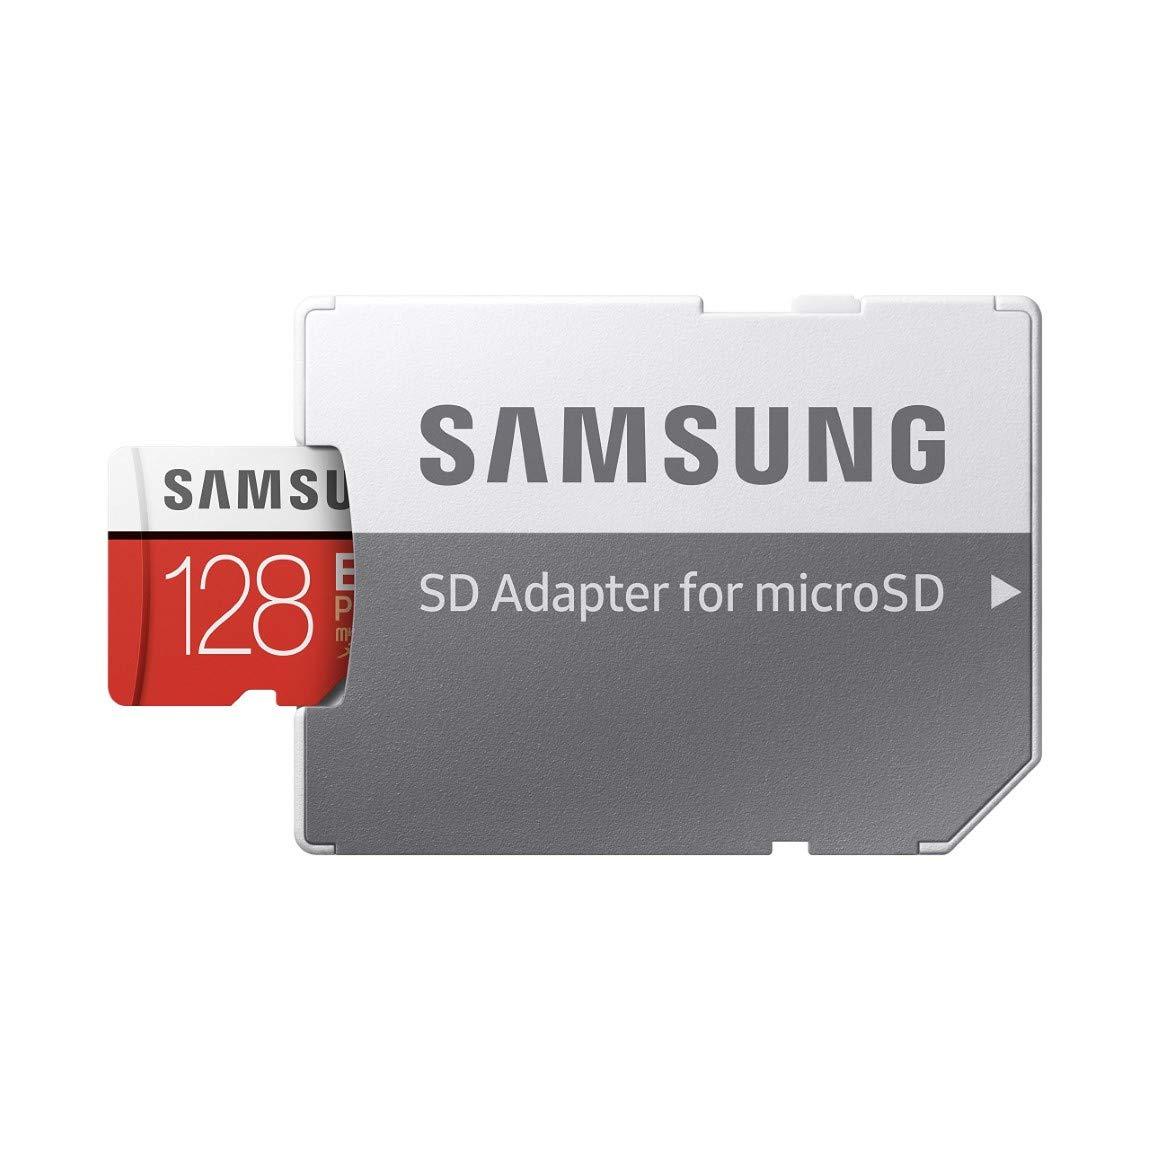 SAMSUNG 128GB EVO Plus Class 10 Micro SDXC with Adapter (MB-MC128GA)